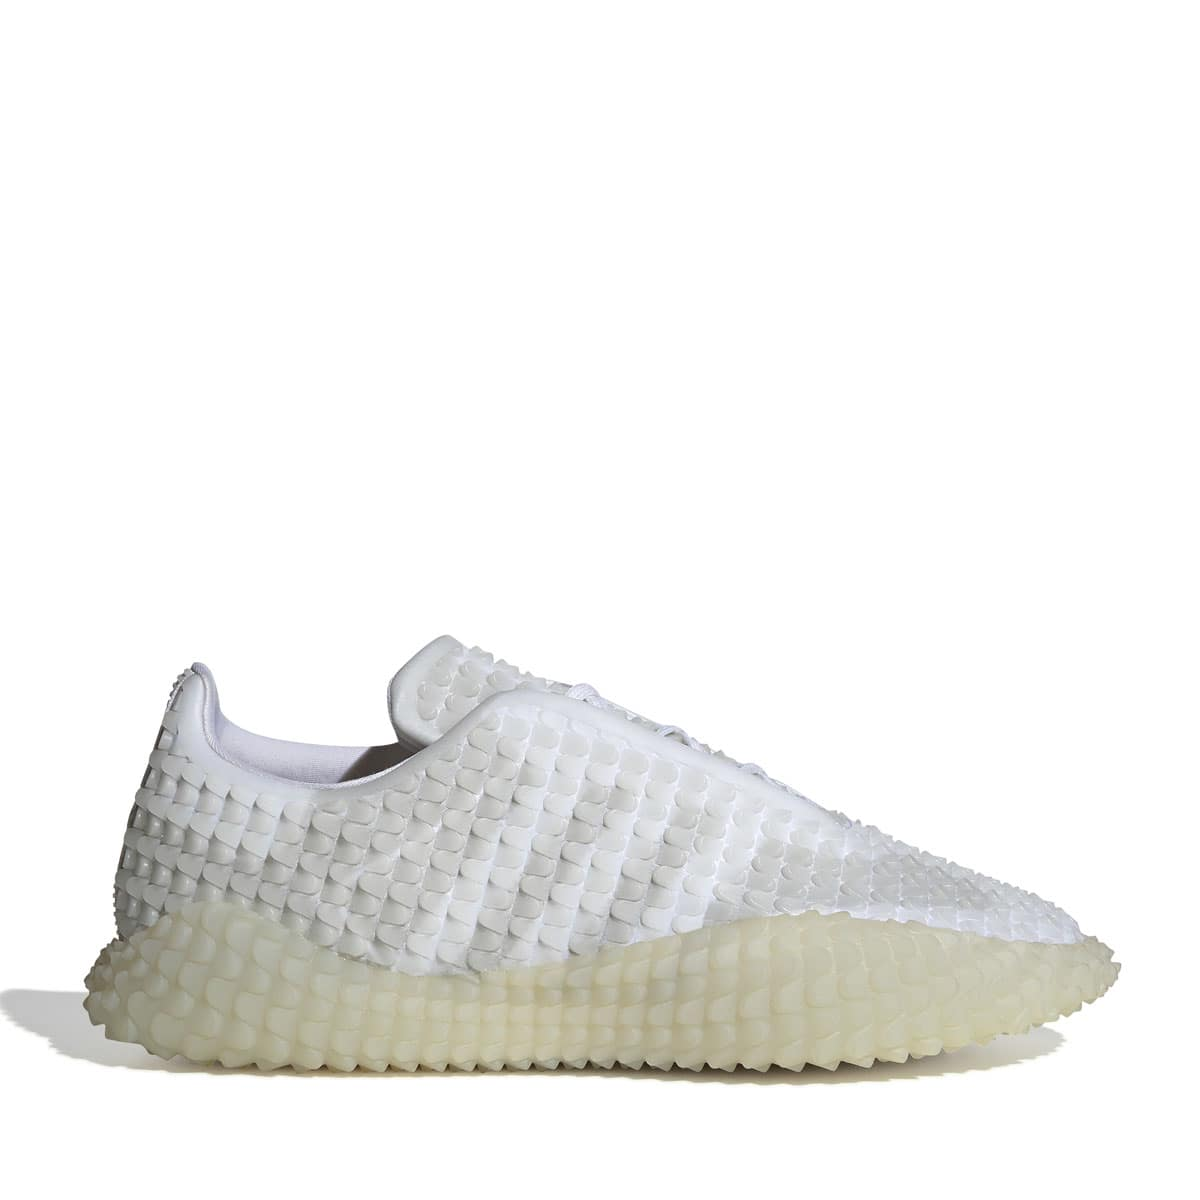 adidas CG GRADDFA AKH CORE WHITE/CORE WHITE/CORE WHITE 20SS-S_photo_large